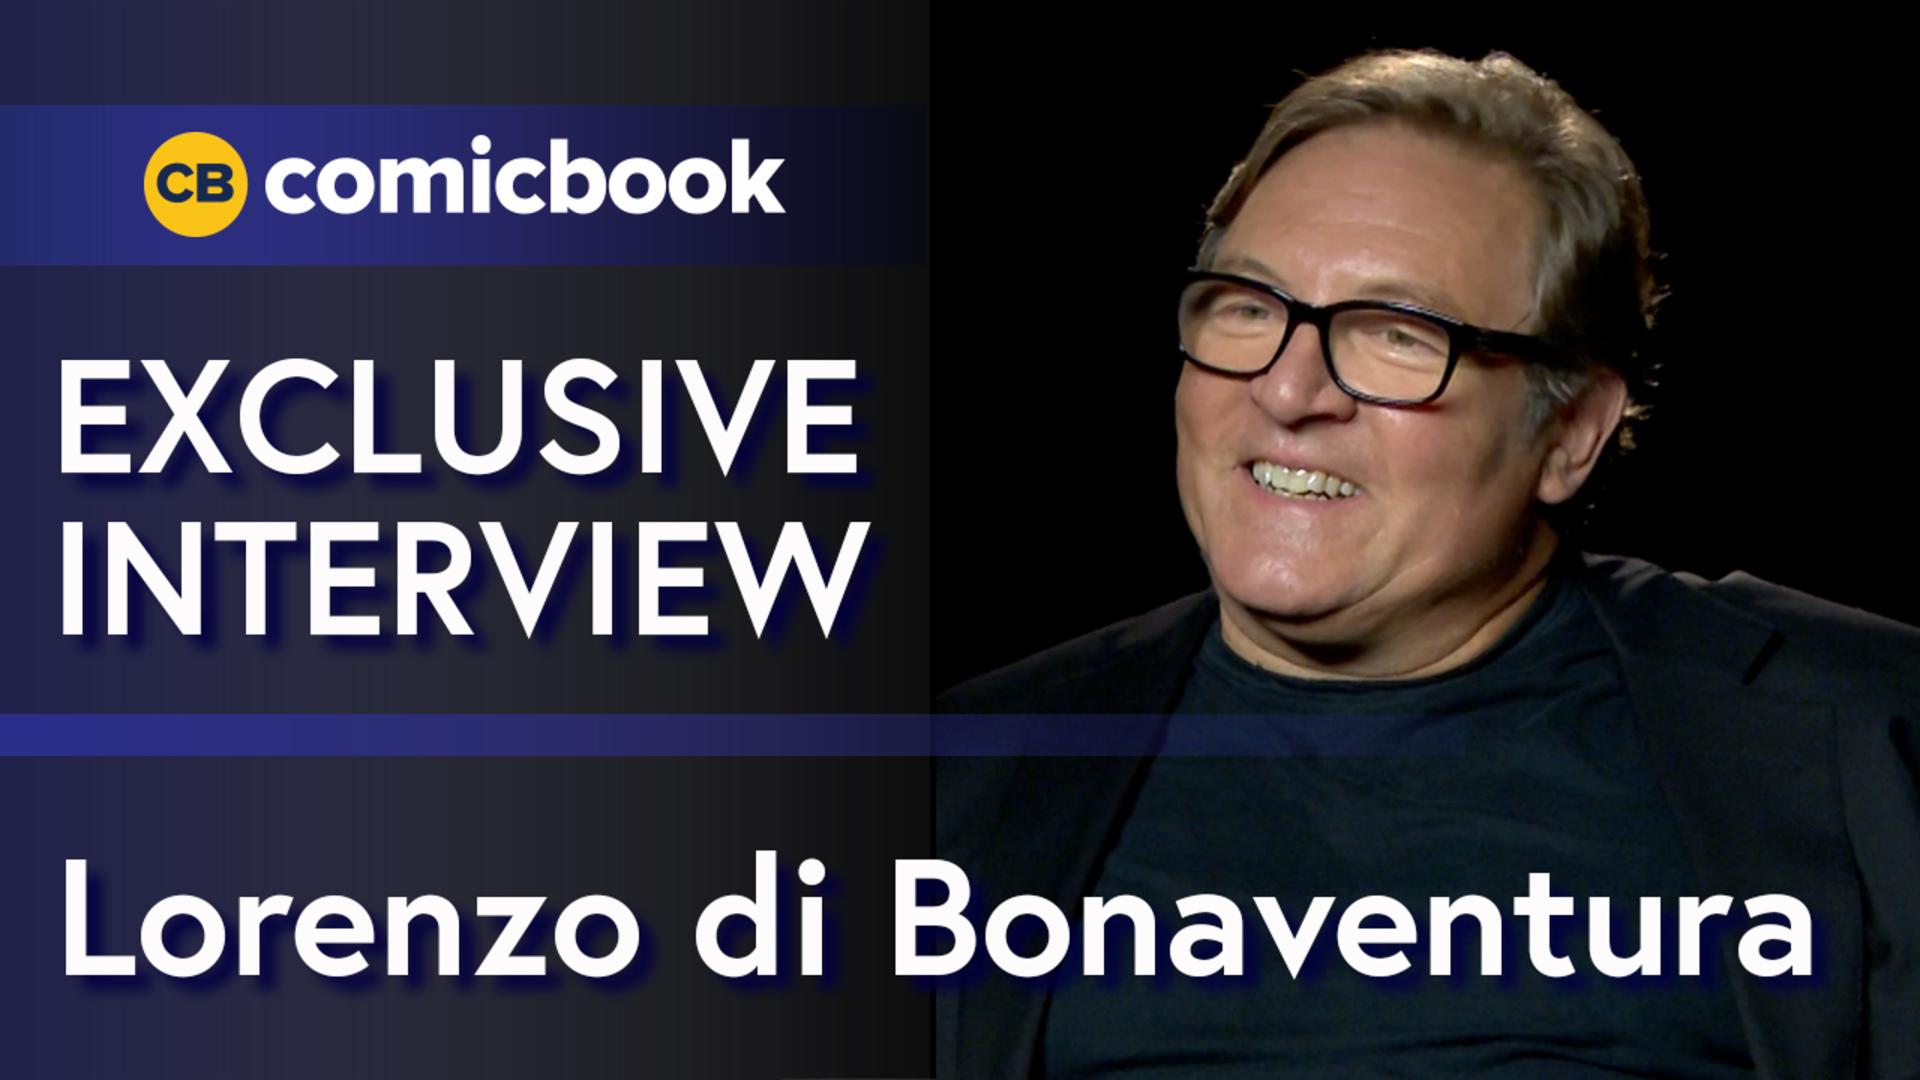 Lorenzo di Bonaventura Talks Transformers: The Last Knight screen capture